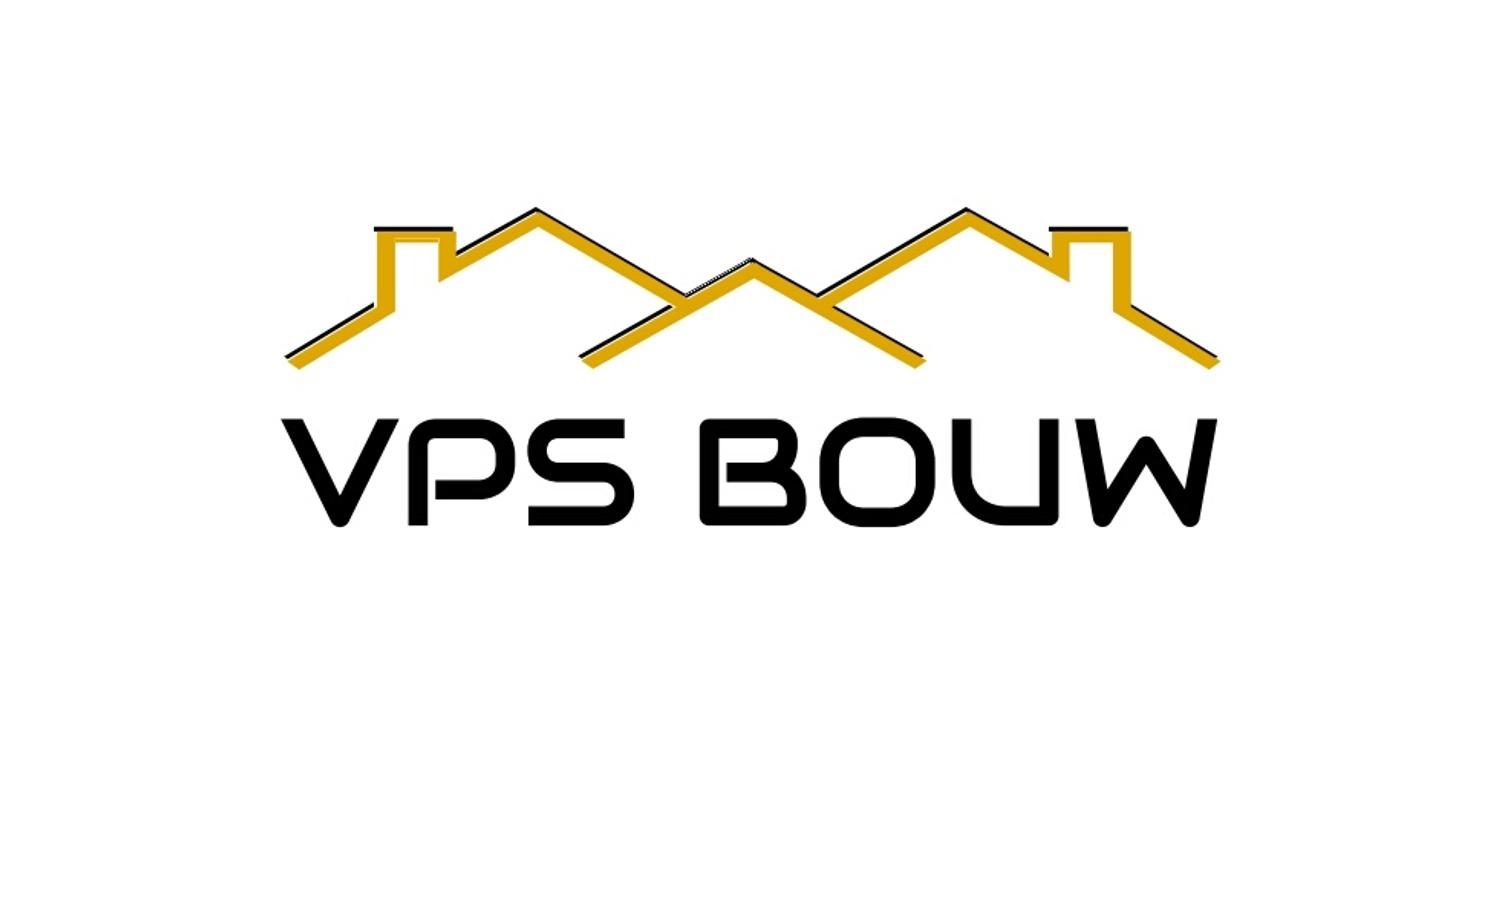 Van Poucke logo